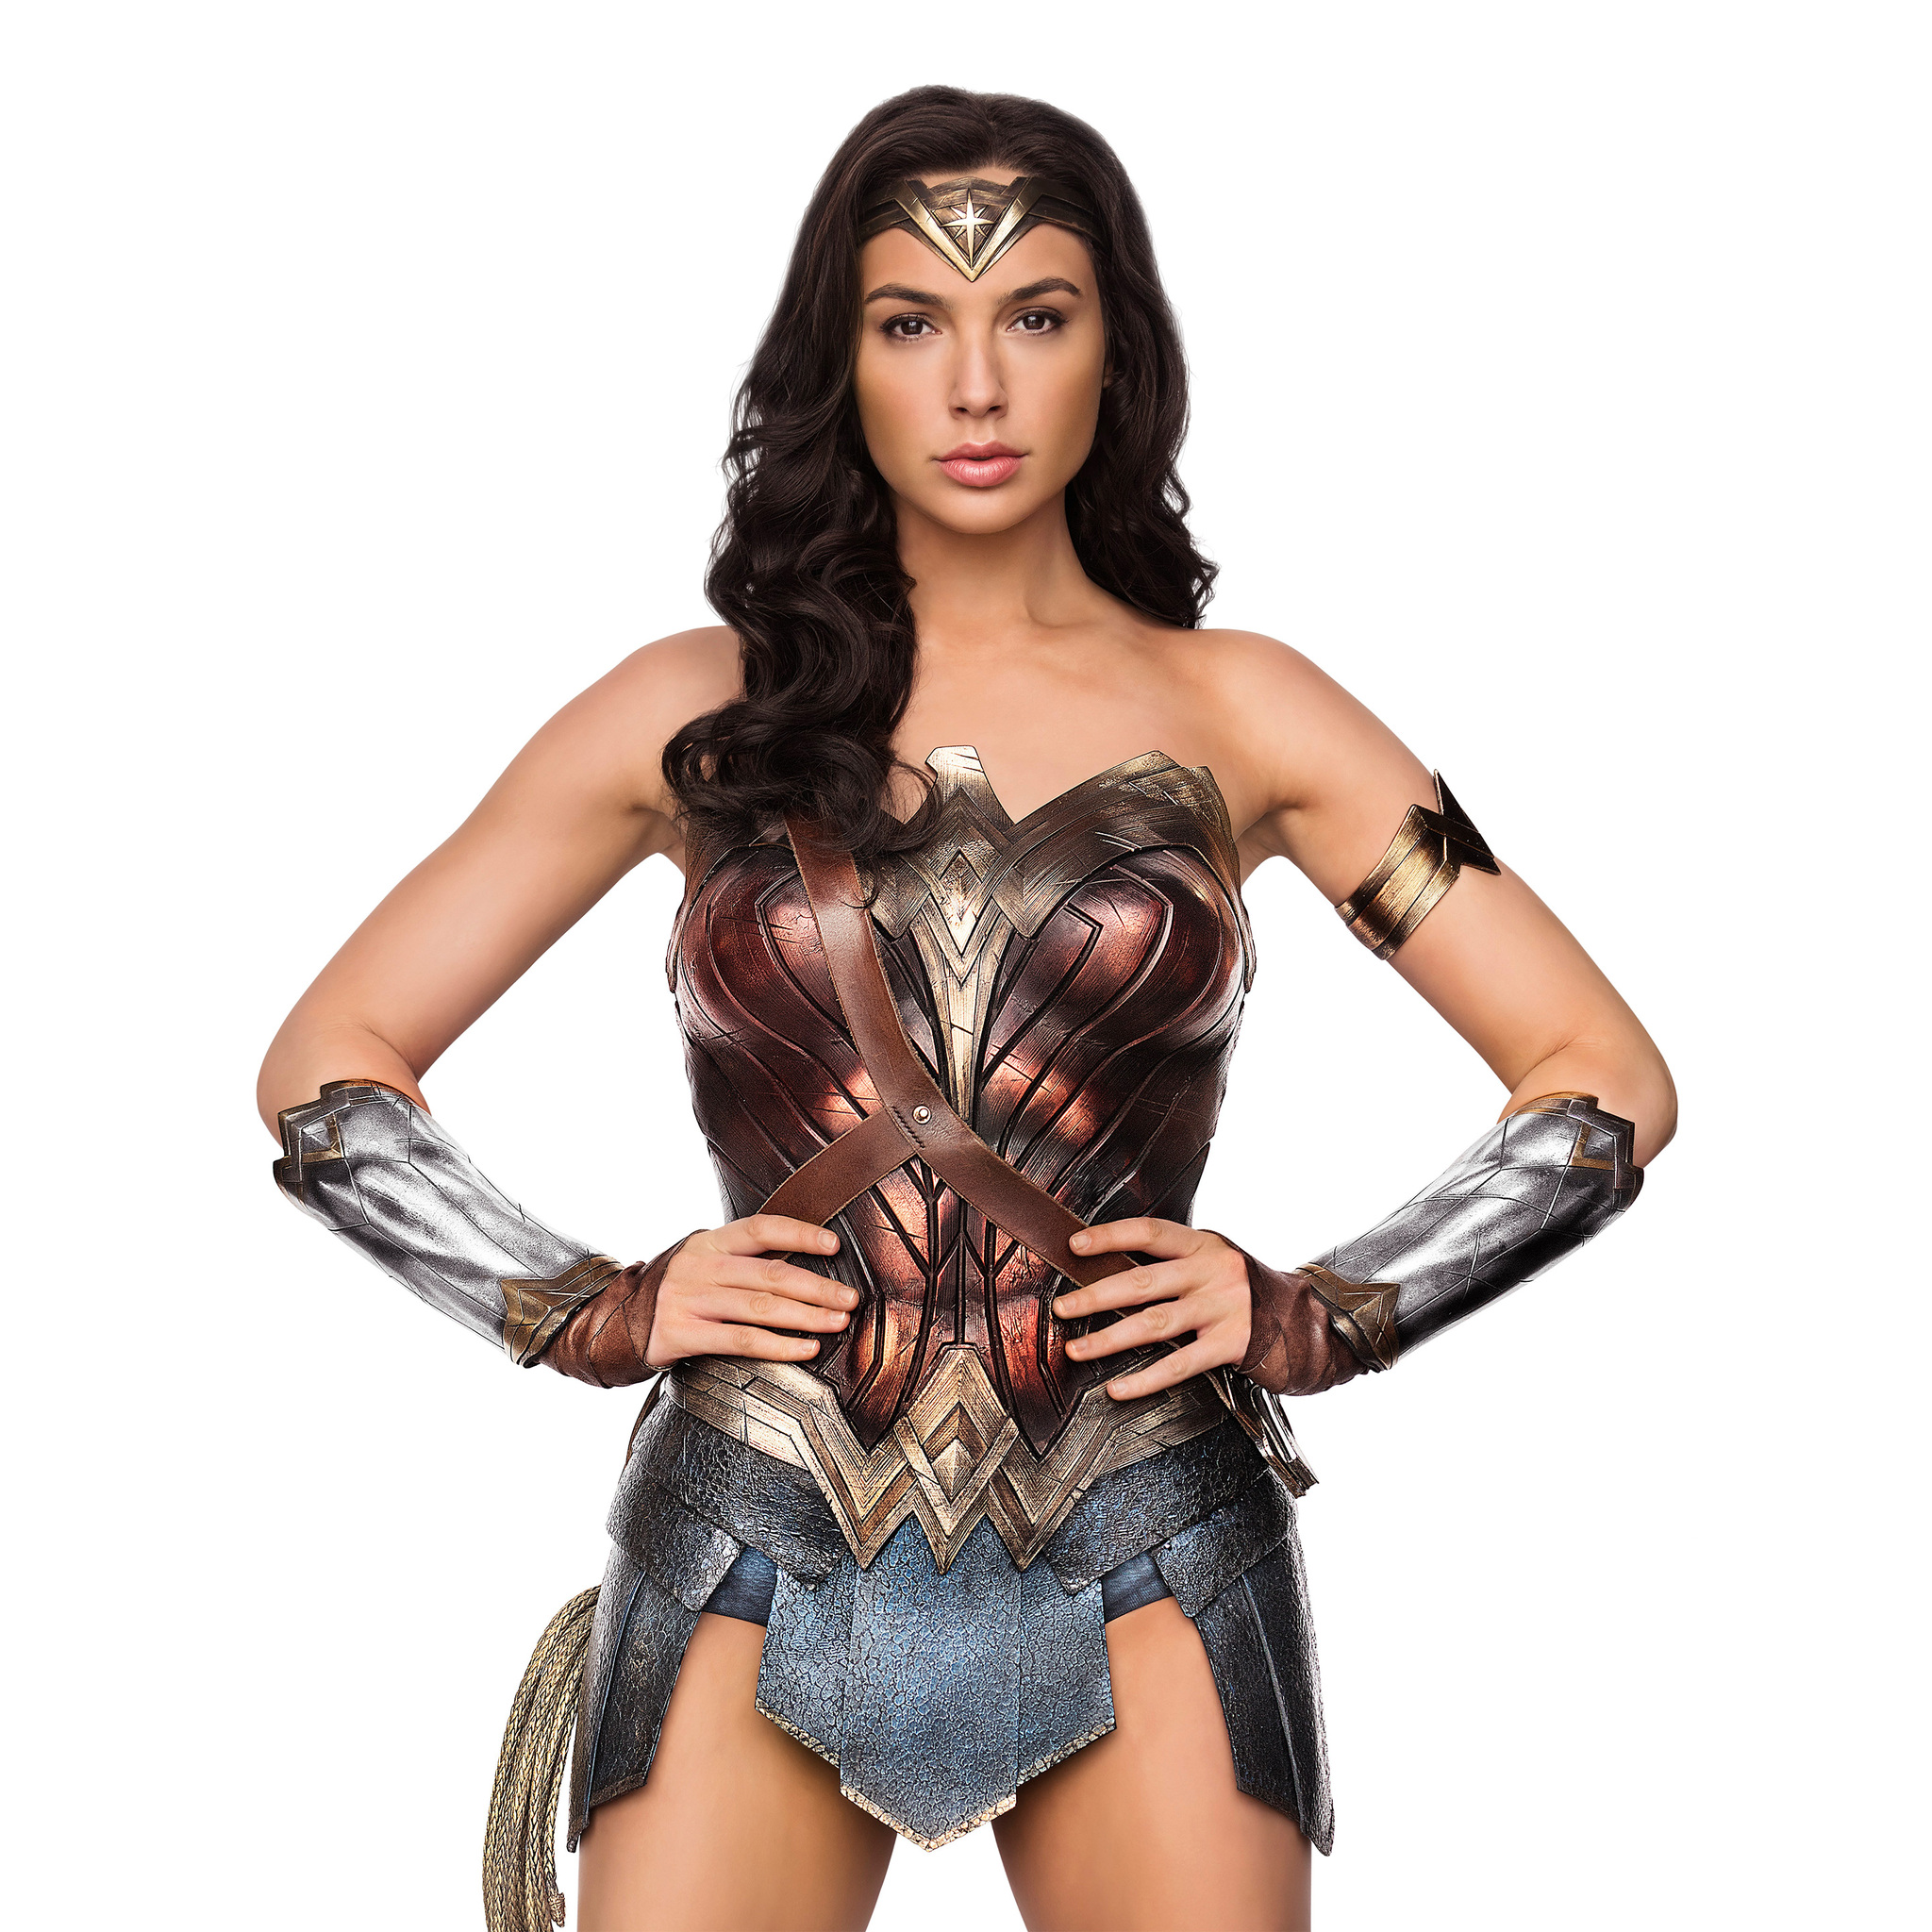 2048x2048 Gal Gadot Wonder Woman 5k Ipad Air HD 4k Wallpapers, Images, Backgrounds, Photos and ...